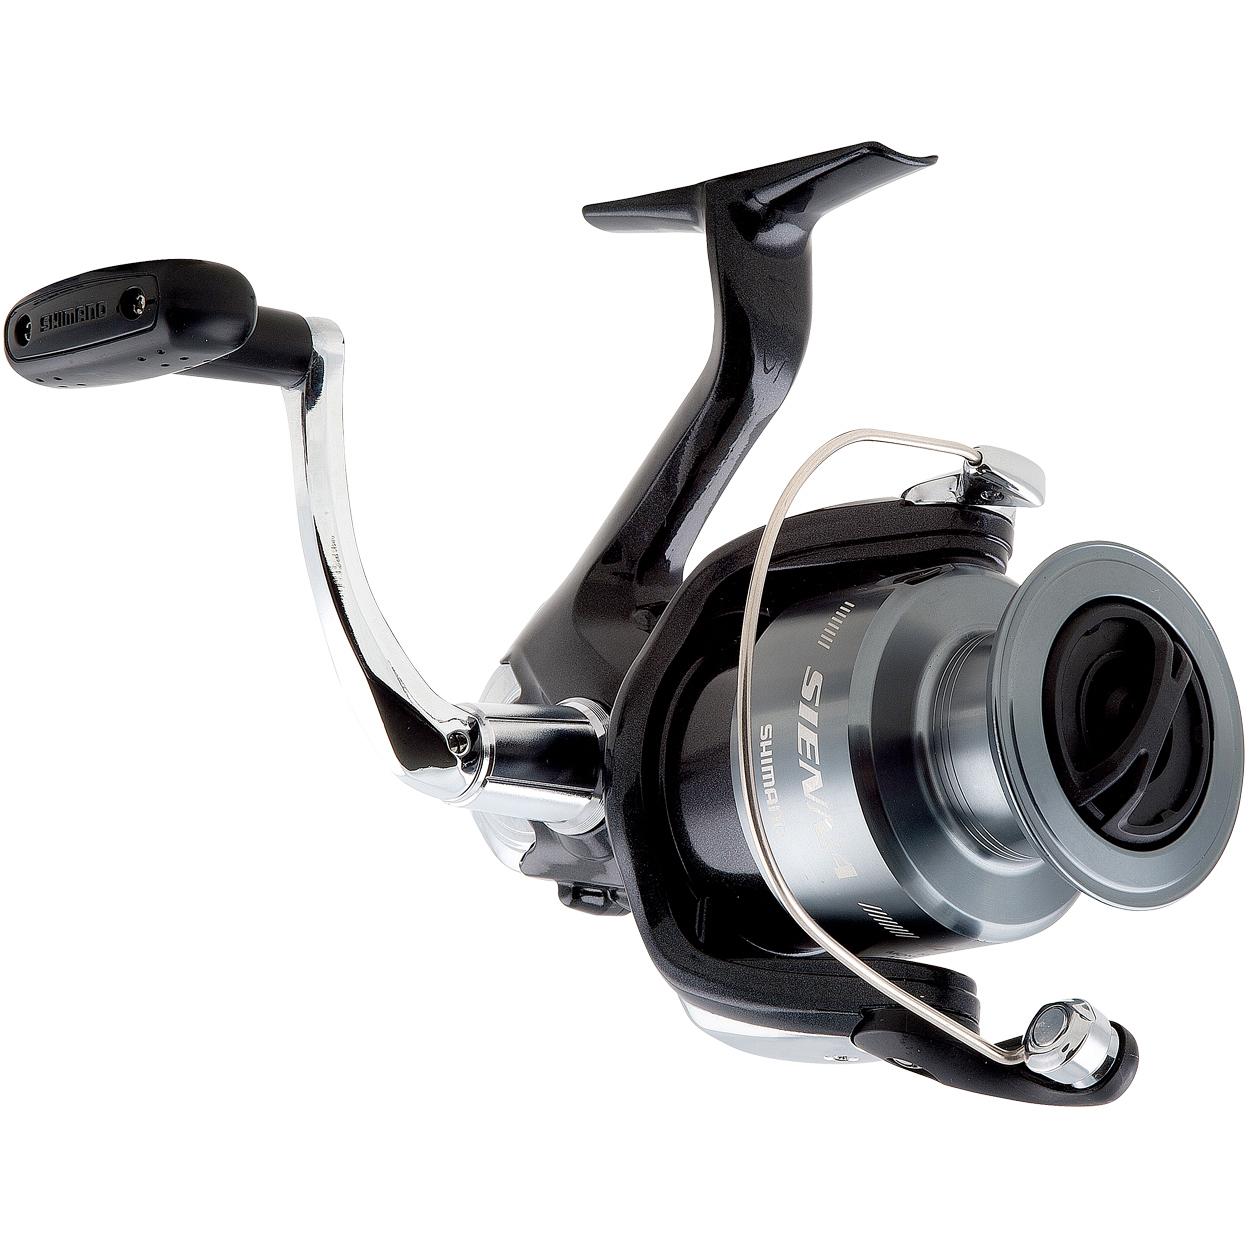 Shimano Sienna FE 2500 Spinning Fishing Reel